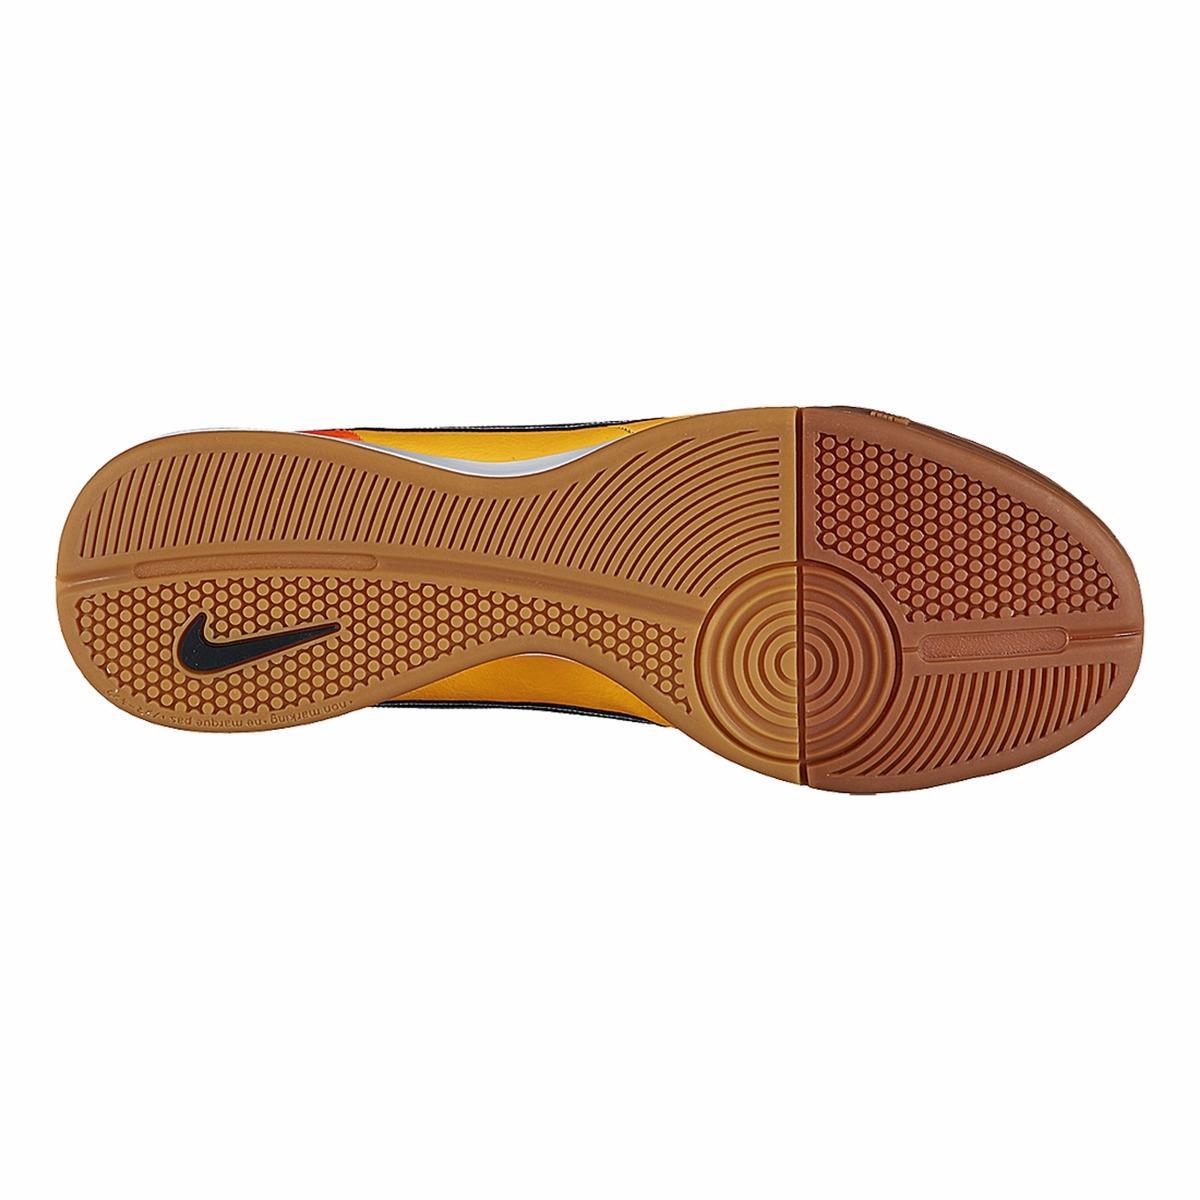 chuteira nike tiempo genio couro leather ic futsal macia. Carregando zoom...  chuteira nike futsal. Carregando zoom. 769f04acb5bb3